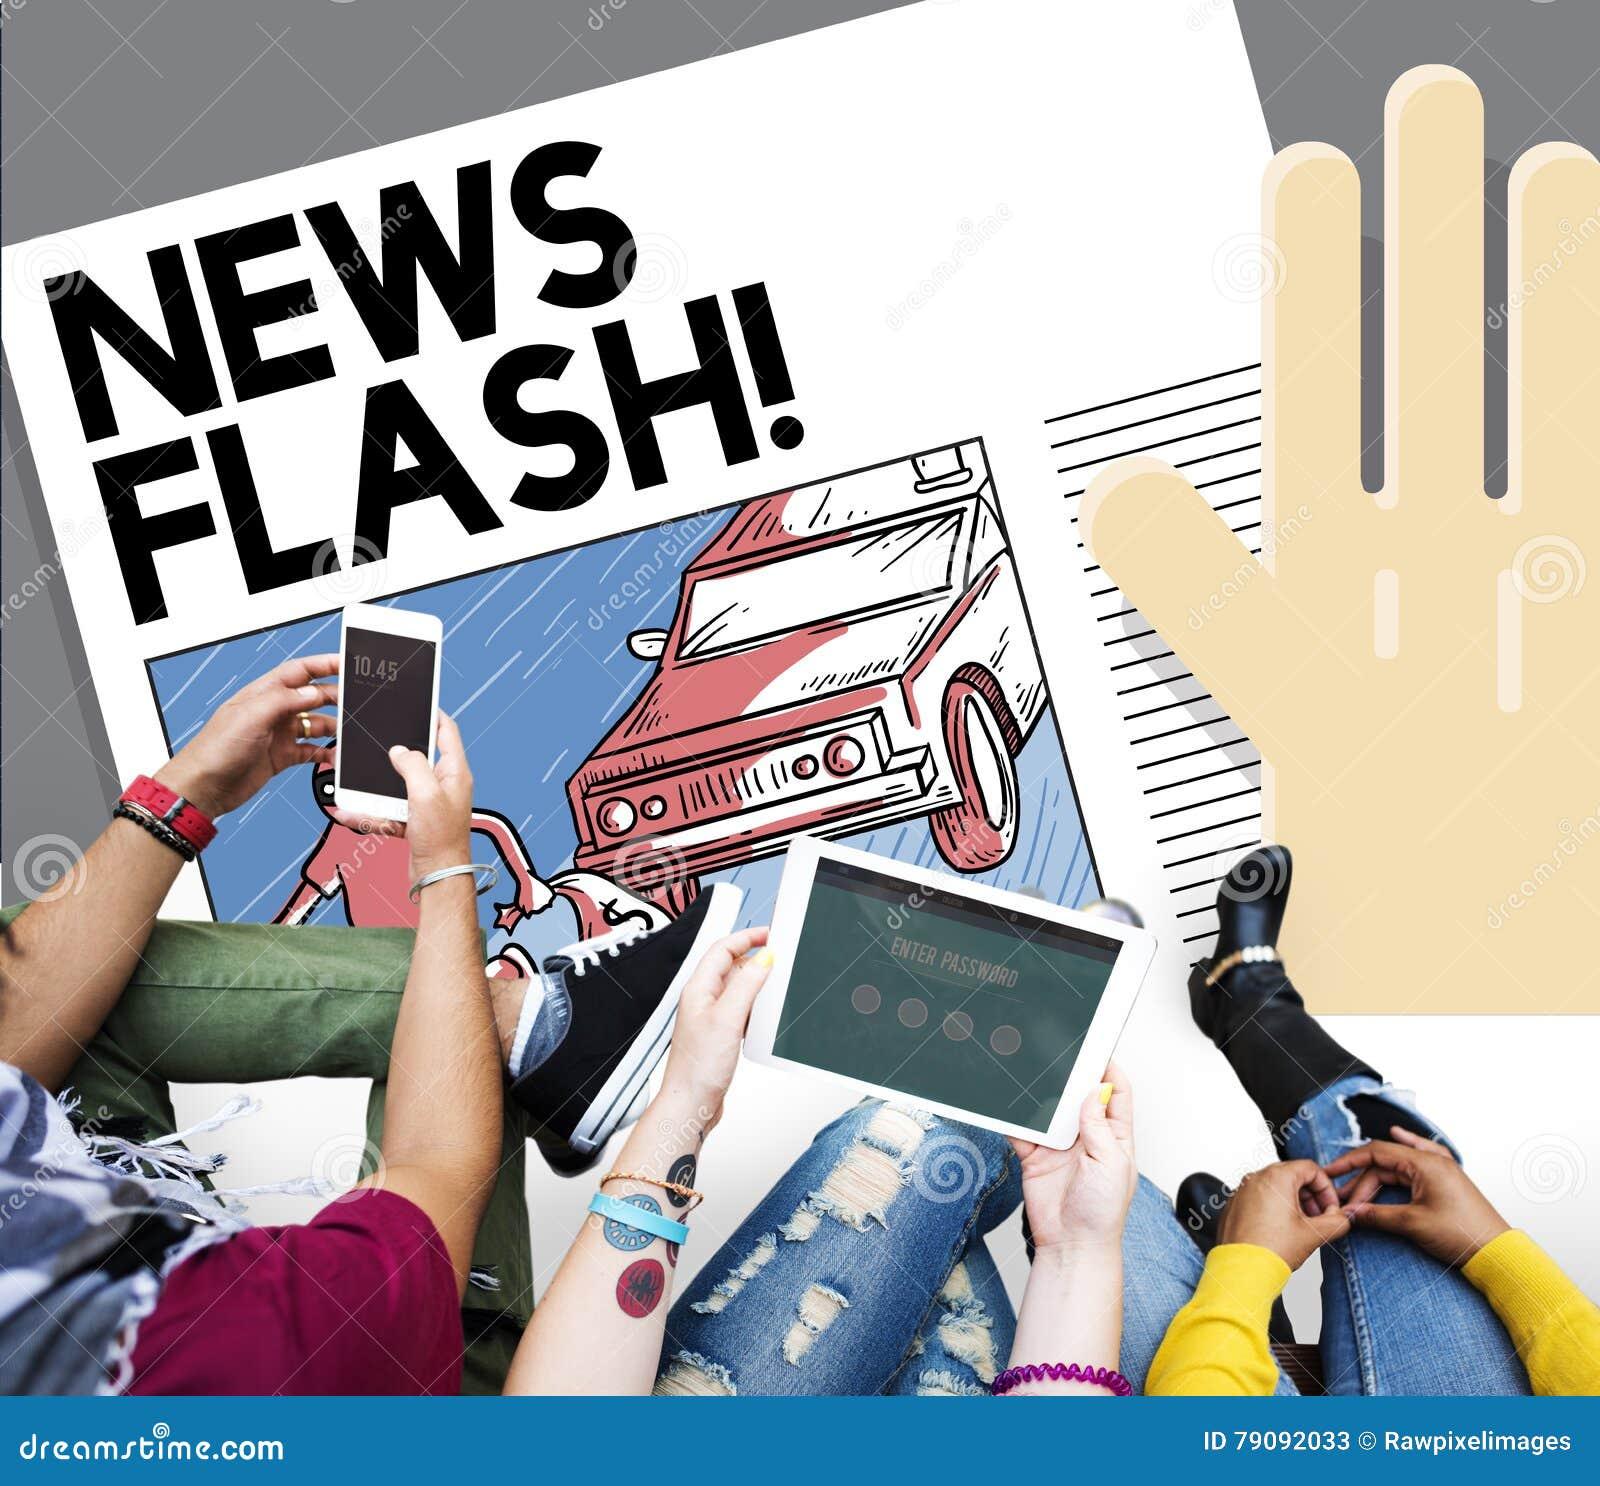 NEWS FLASH Royalty-Free Stock Image   CartoonDealer.com ...